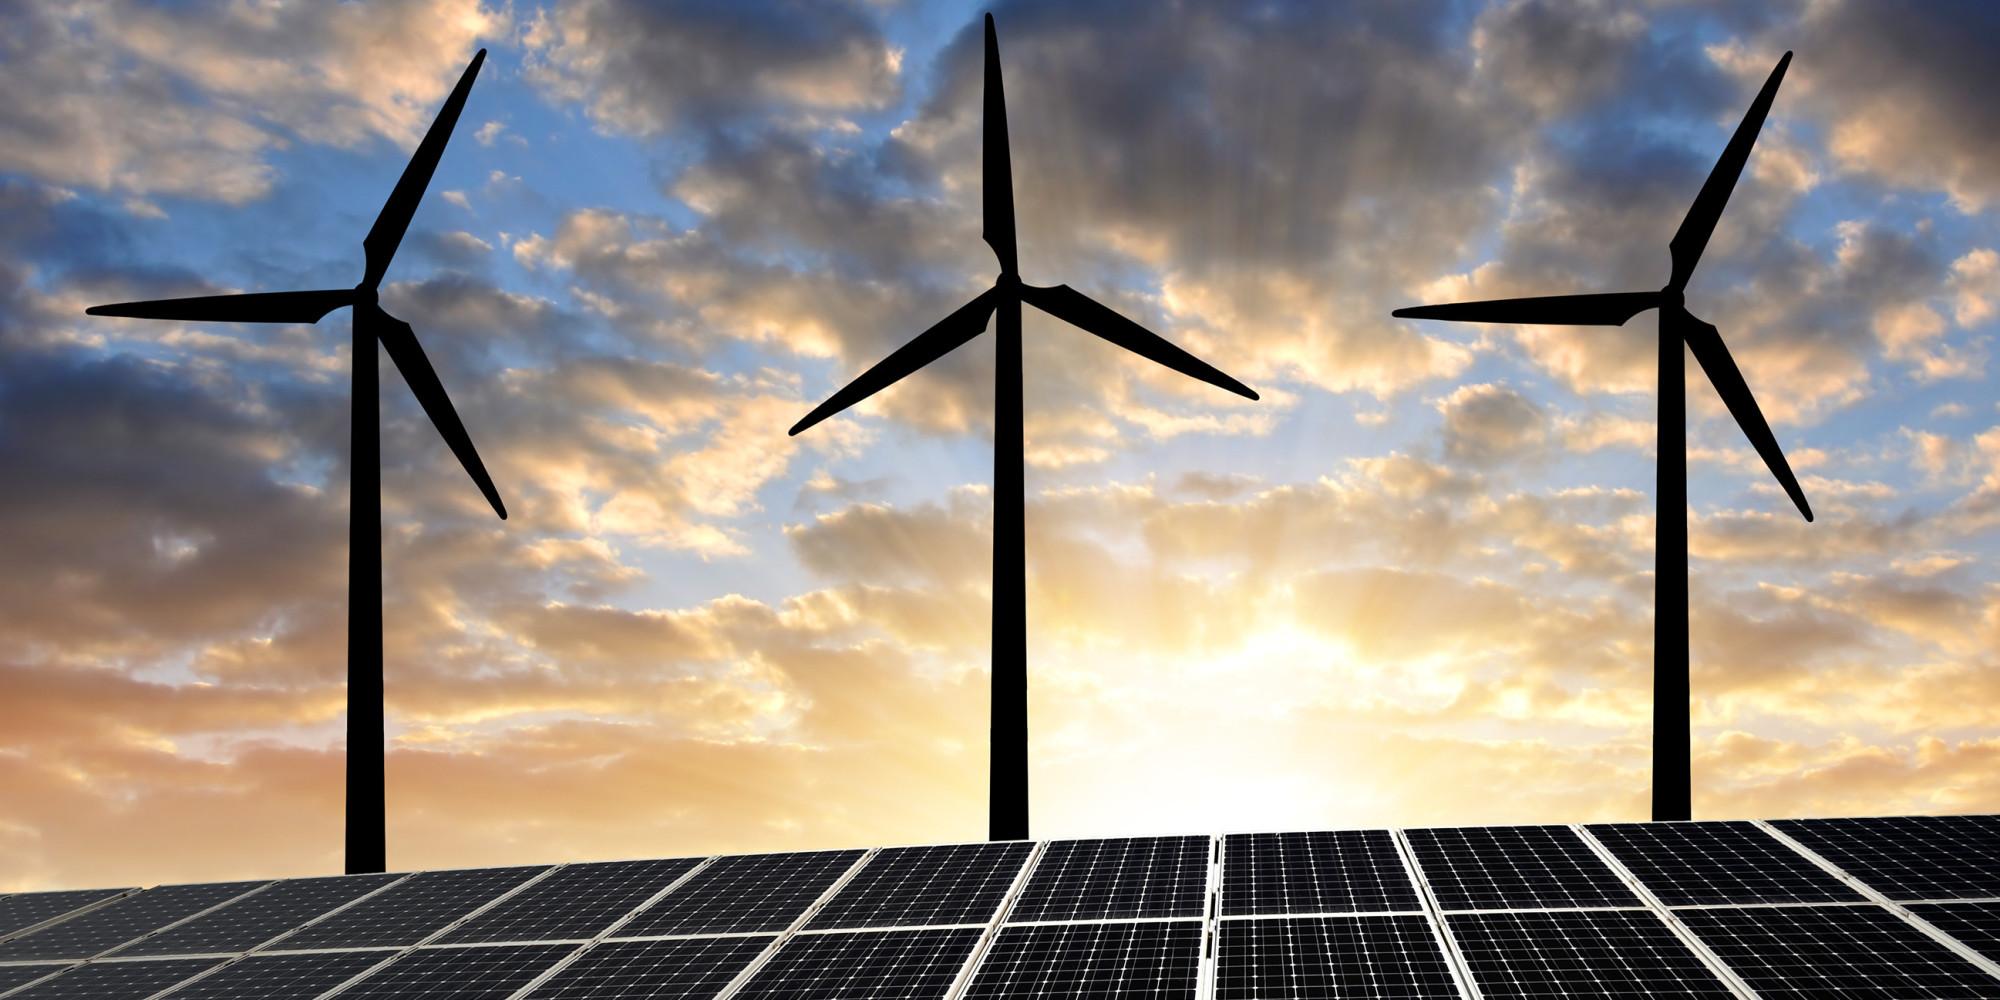 Saudi Arabia, UK sign pact on clean energy